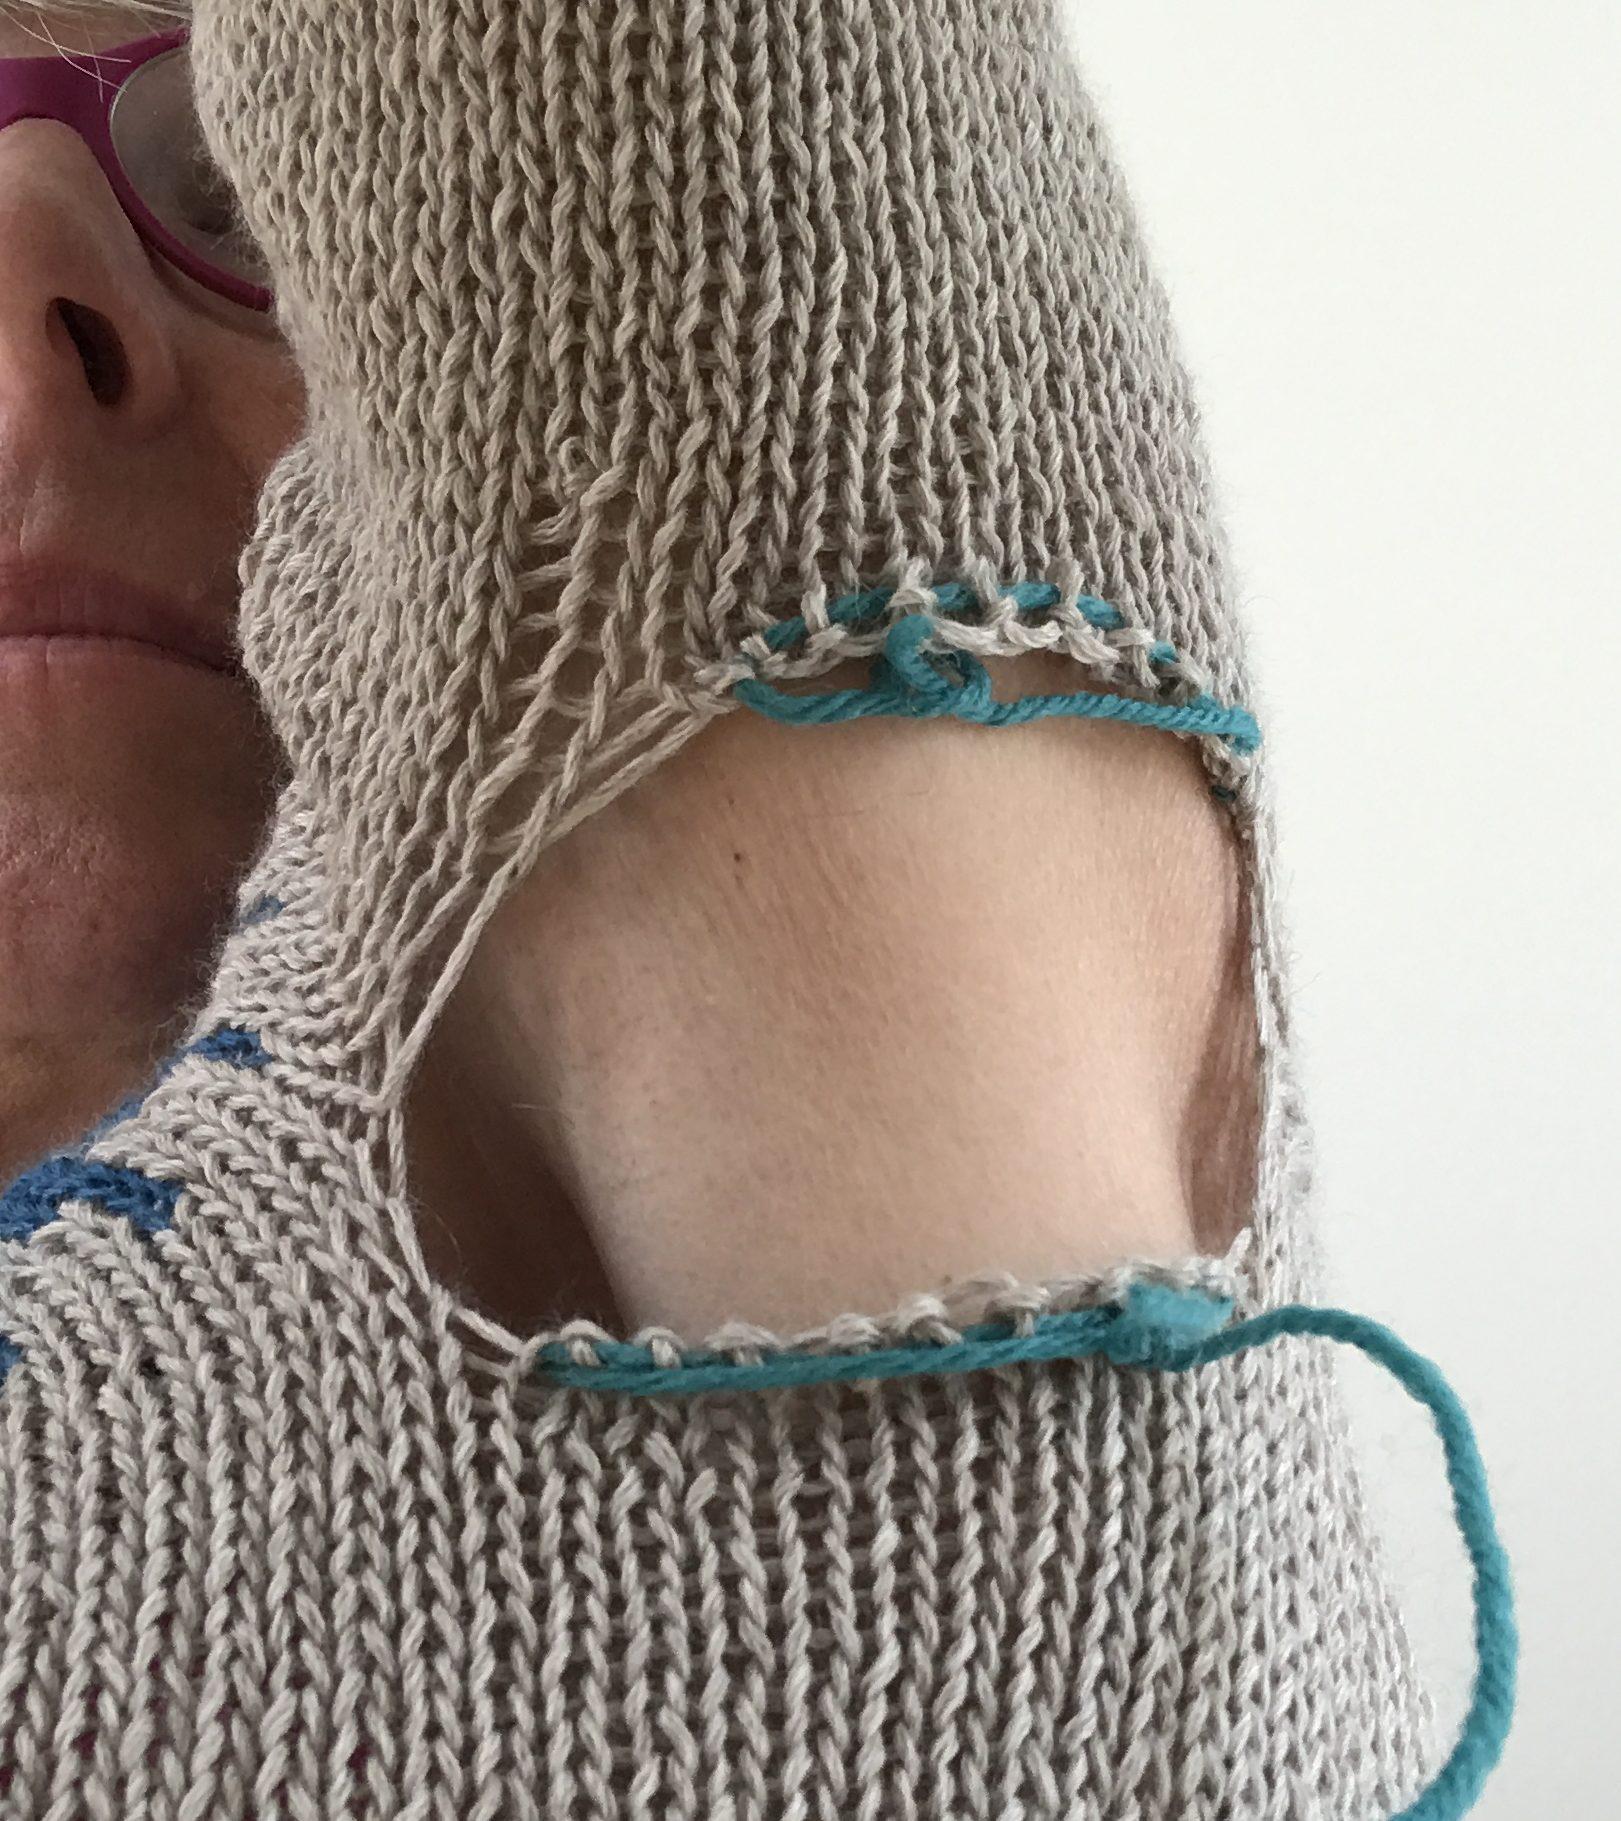 Underarm seam prior to weaving/grafting